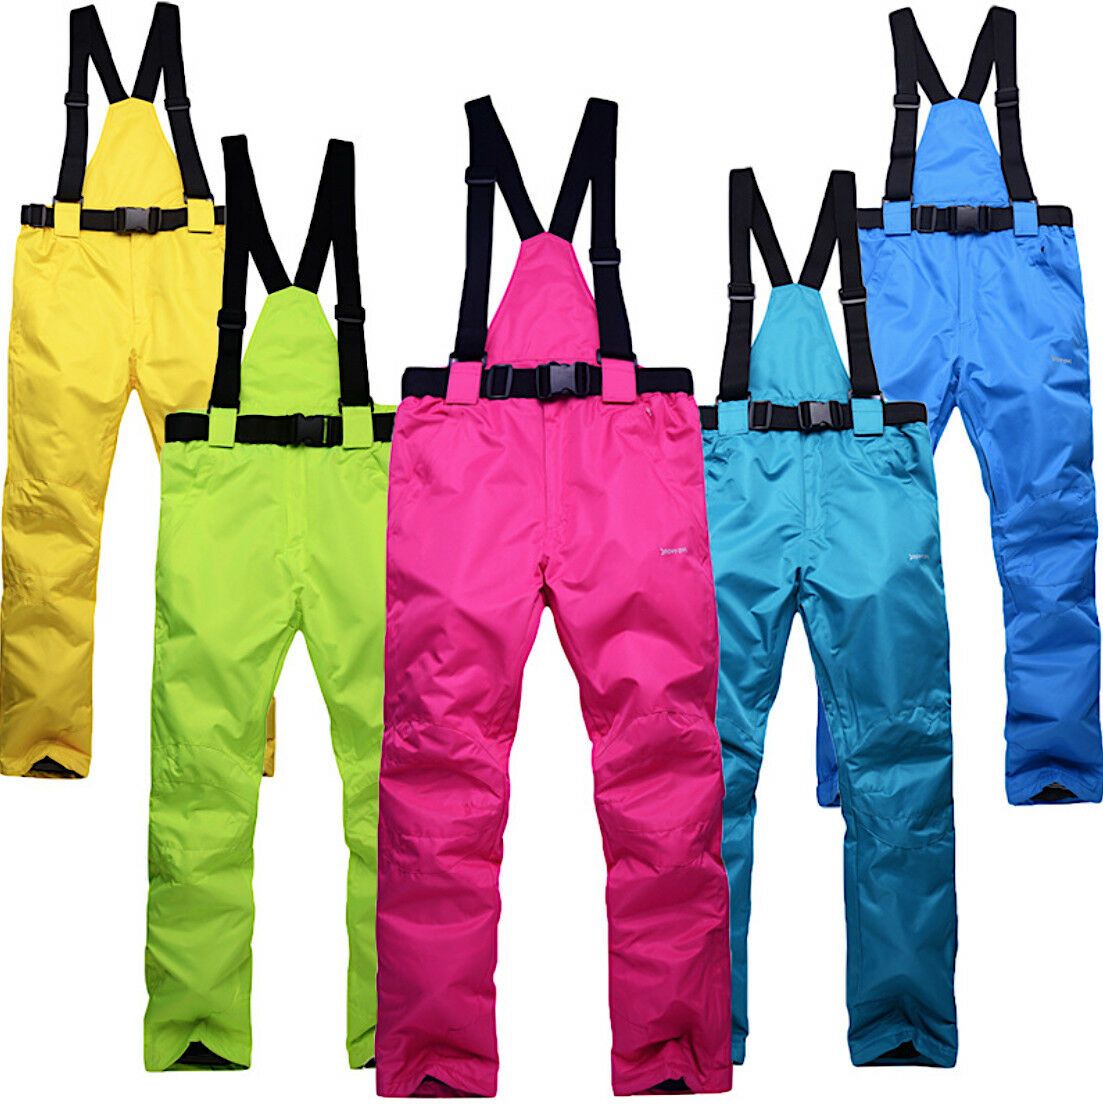 Pantaloni Neve Sci Windproof Waterproof Uomo Donna Ski Pants Unisex PASNW01 P